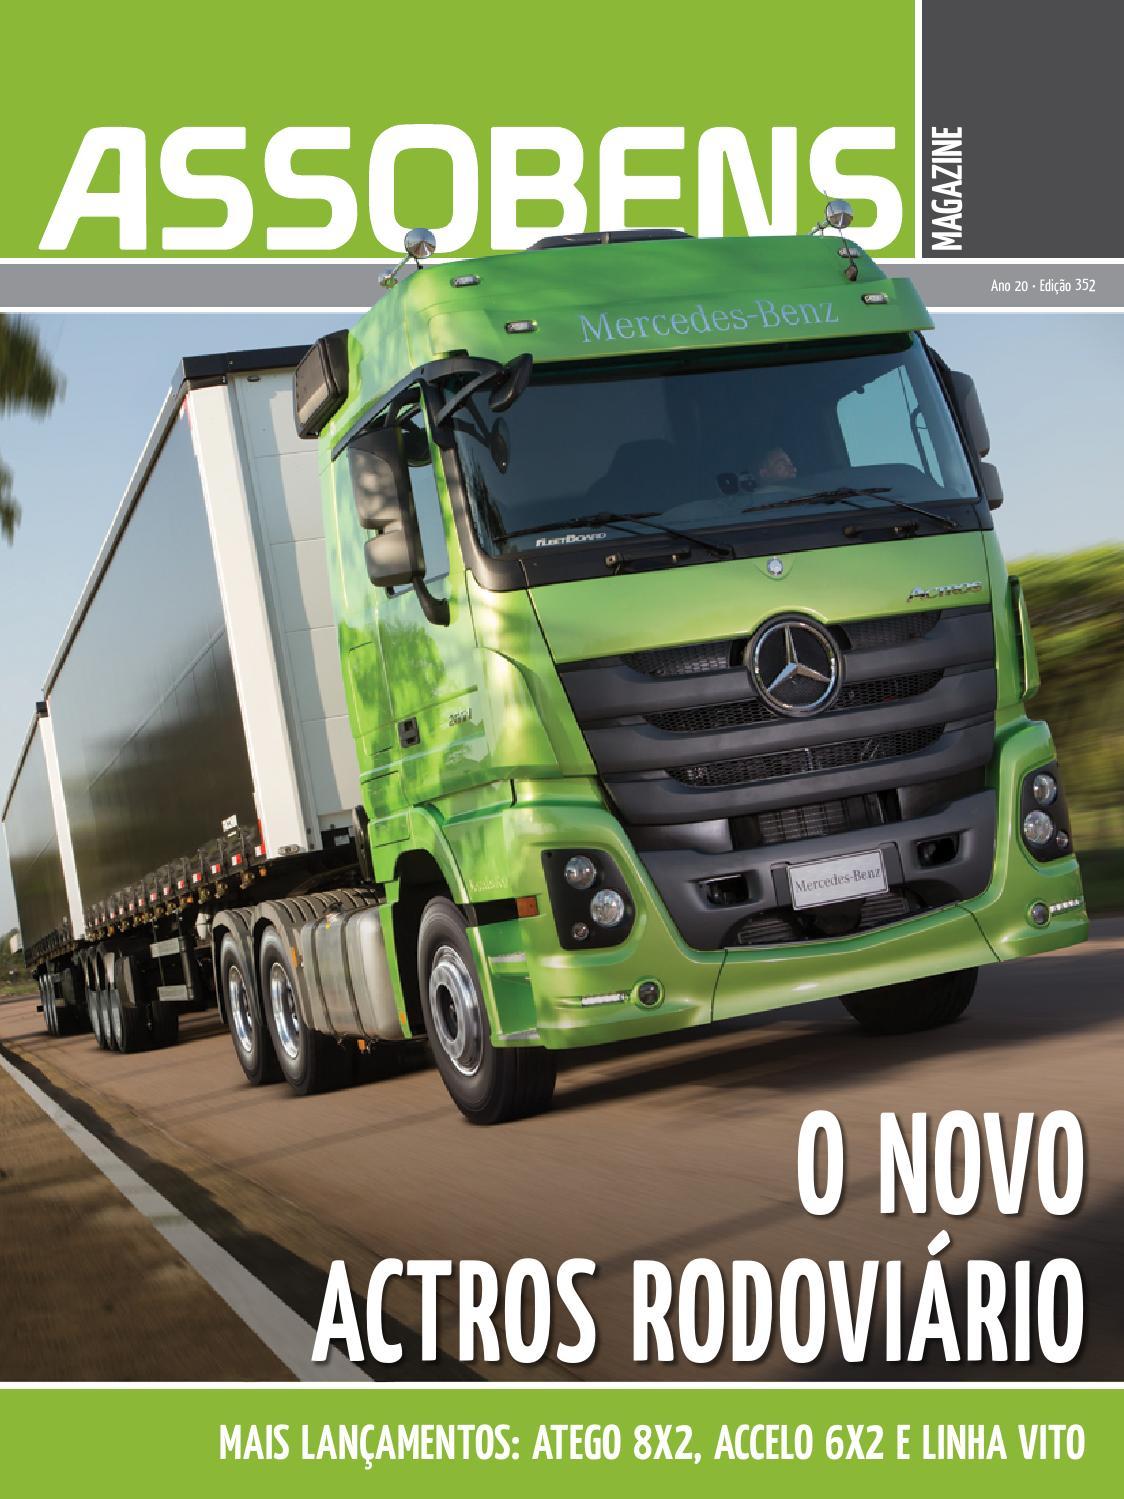 Assobens Magazine 352 by ASSOBENS - issuu 2154ddd603791